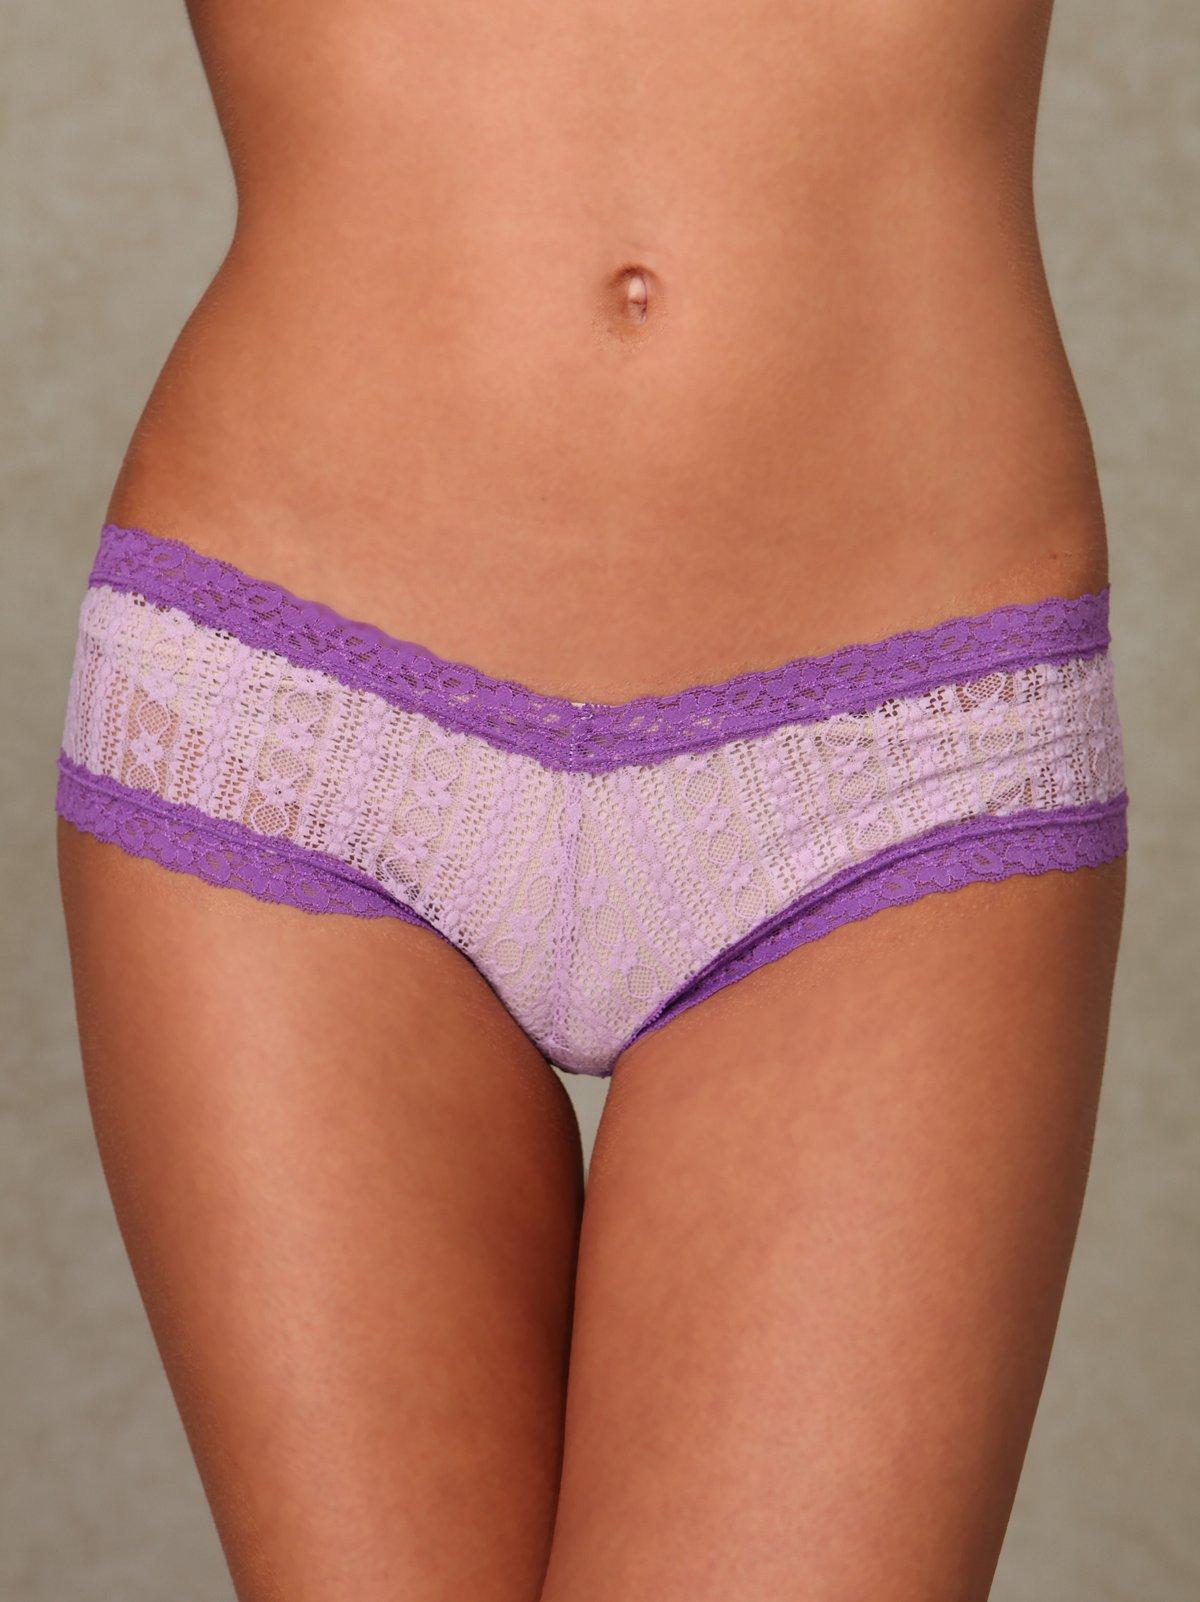 Linear Pucker Lace Pantie